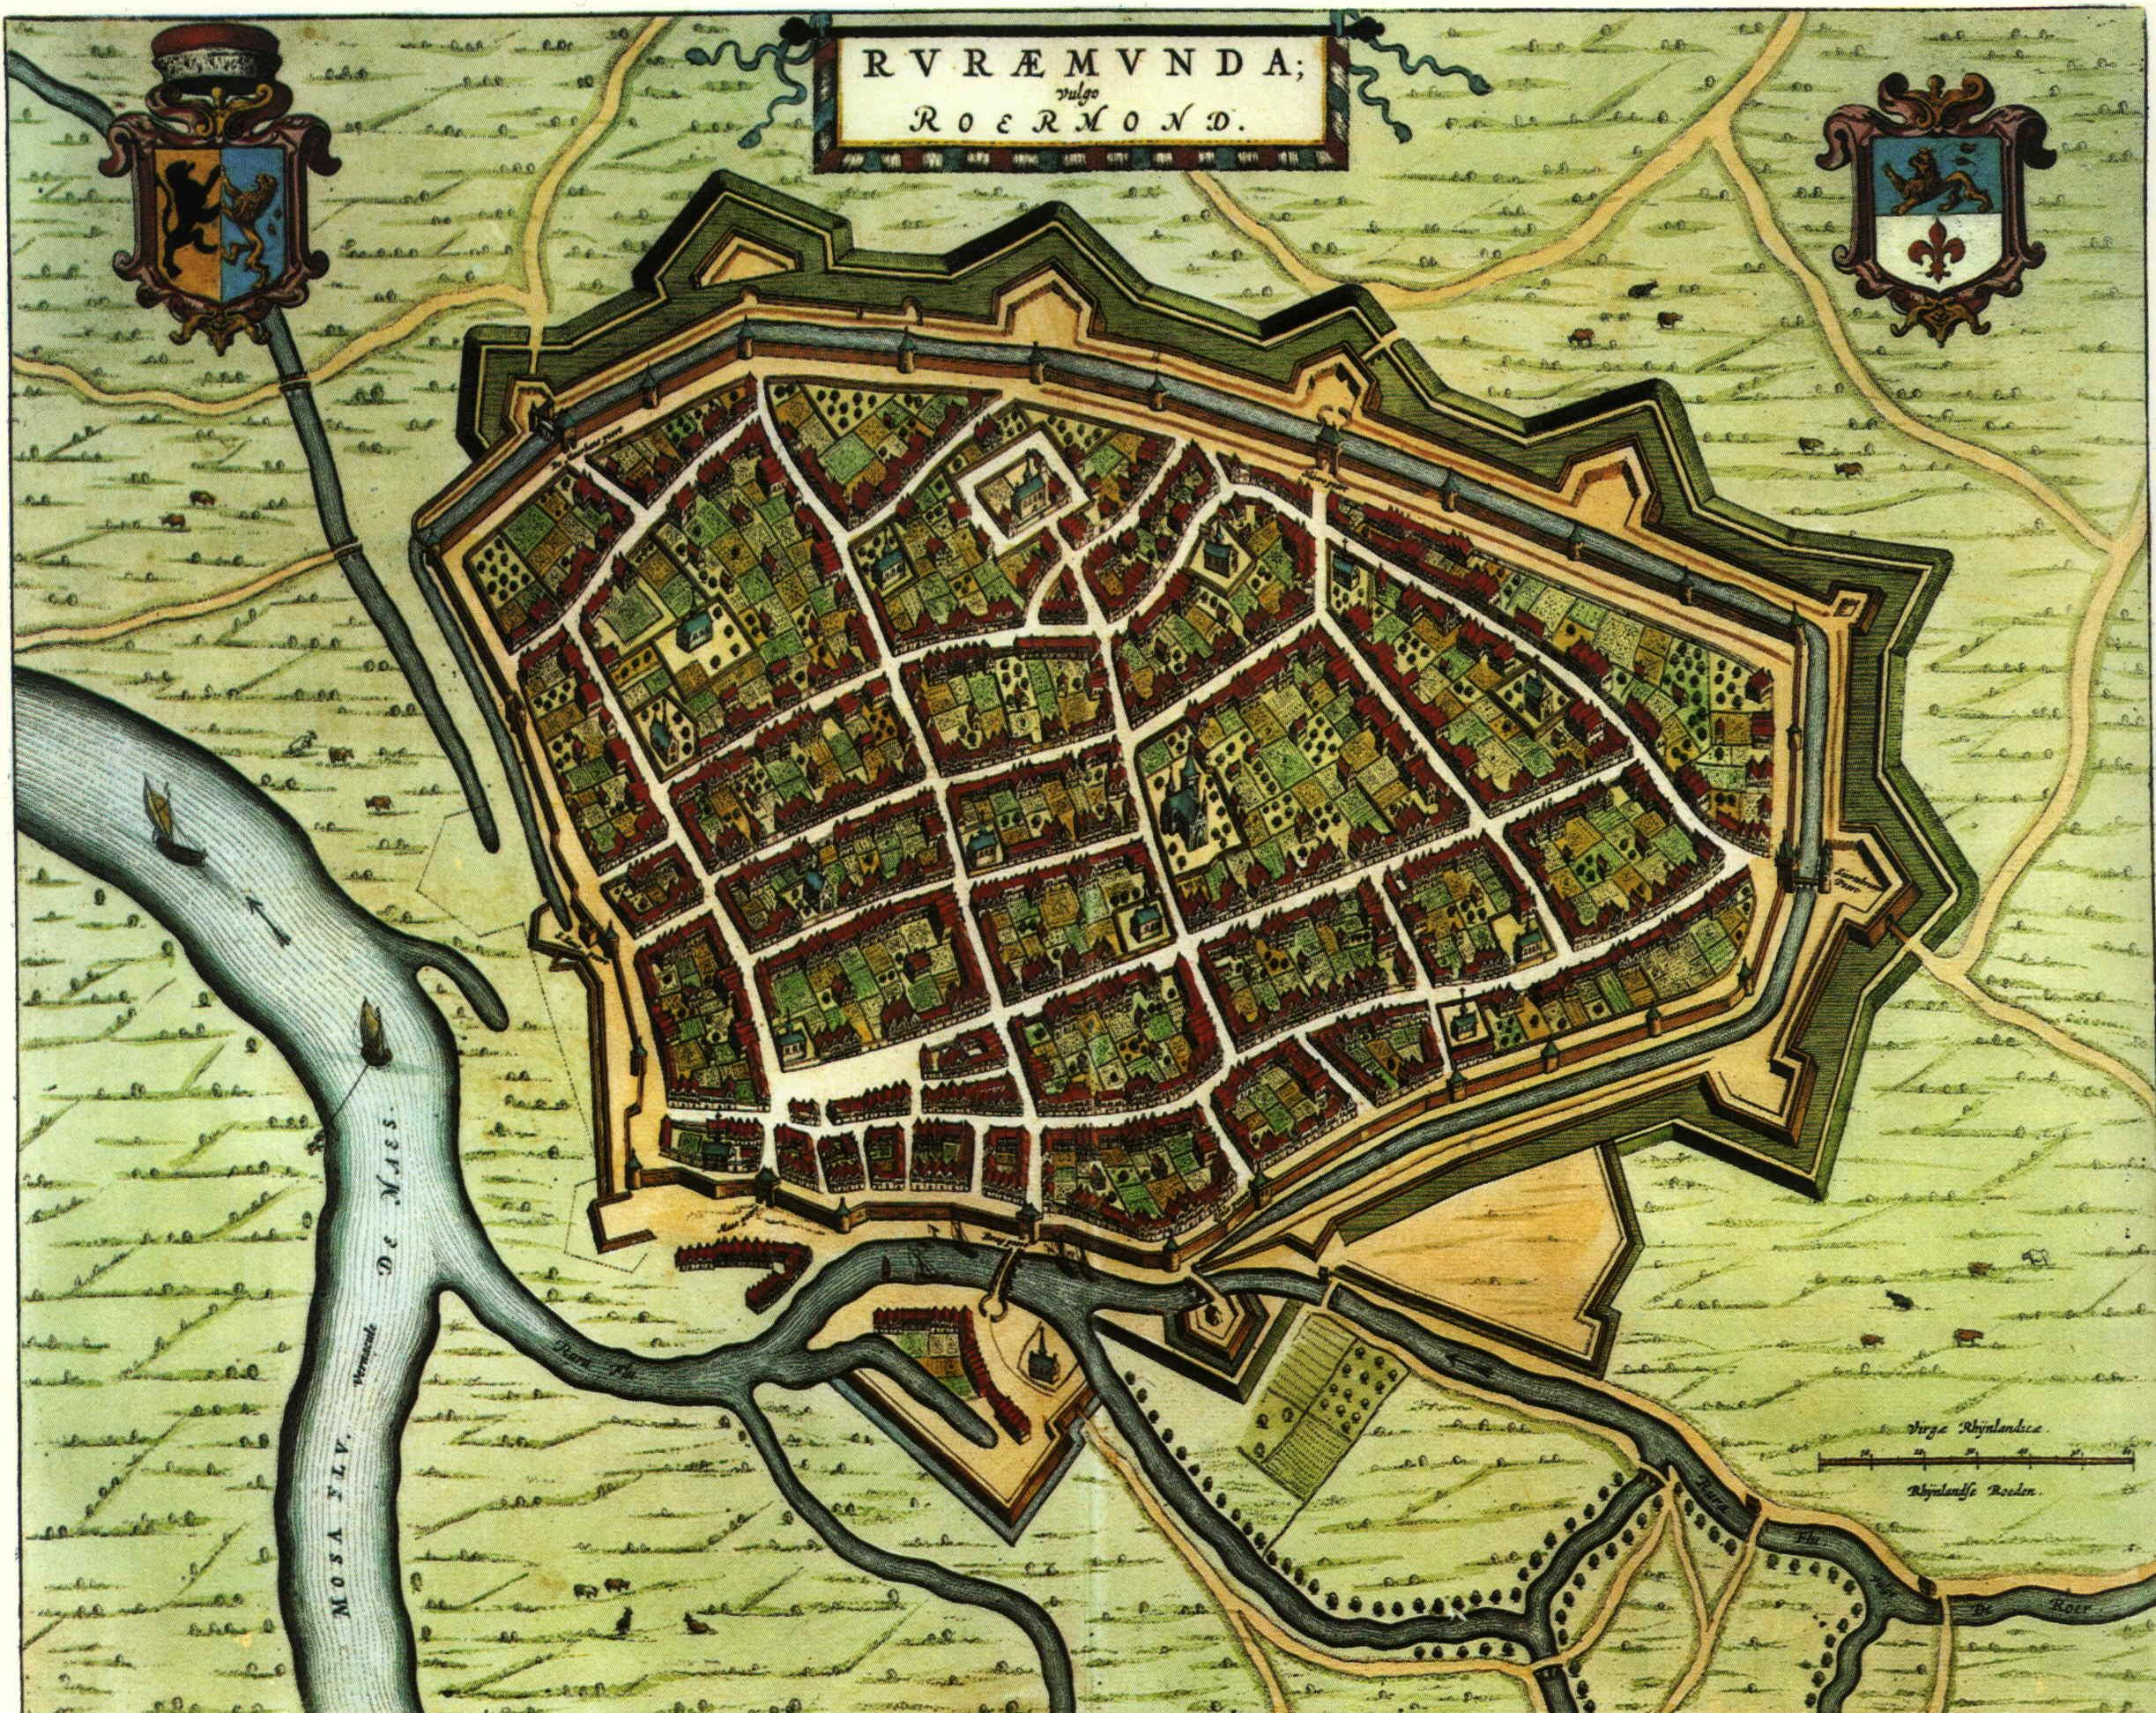 Blaeu Atlas: Roermond ca 1662, Netherlands.